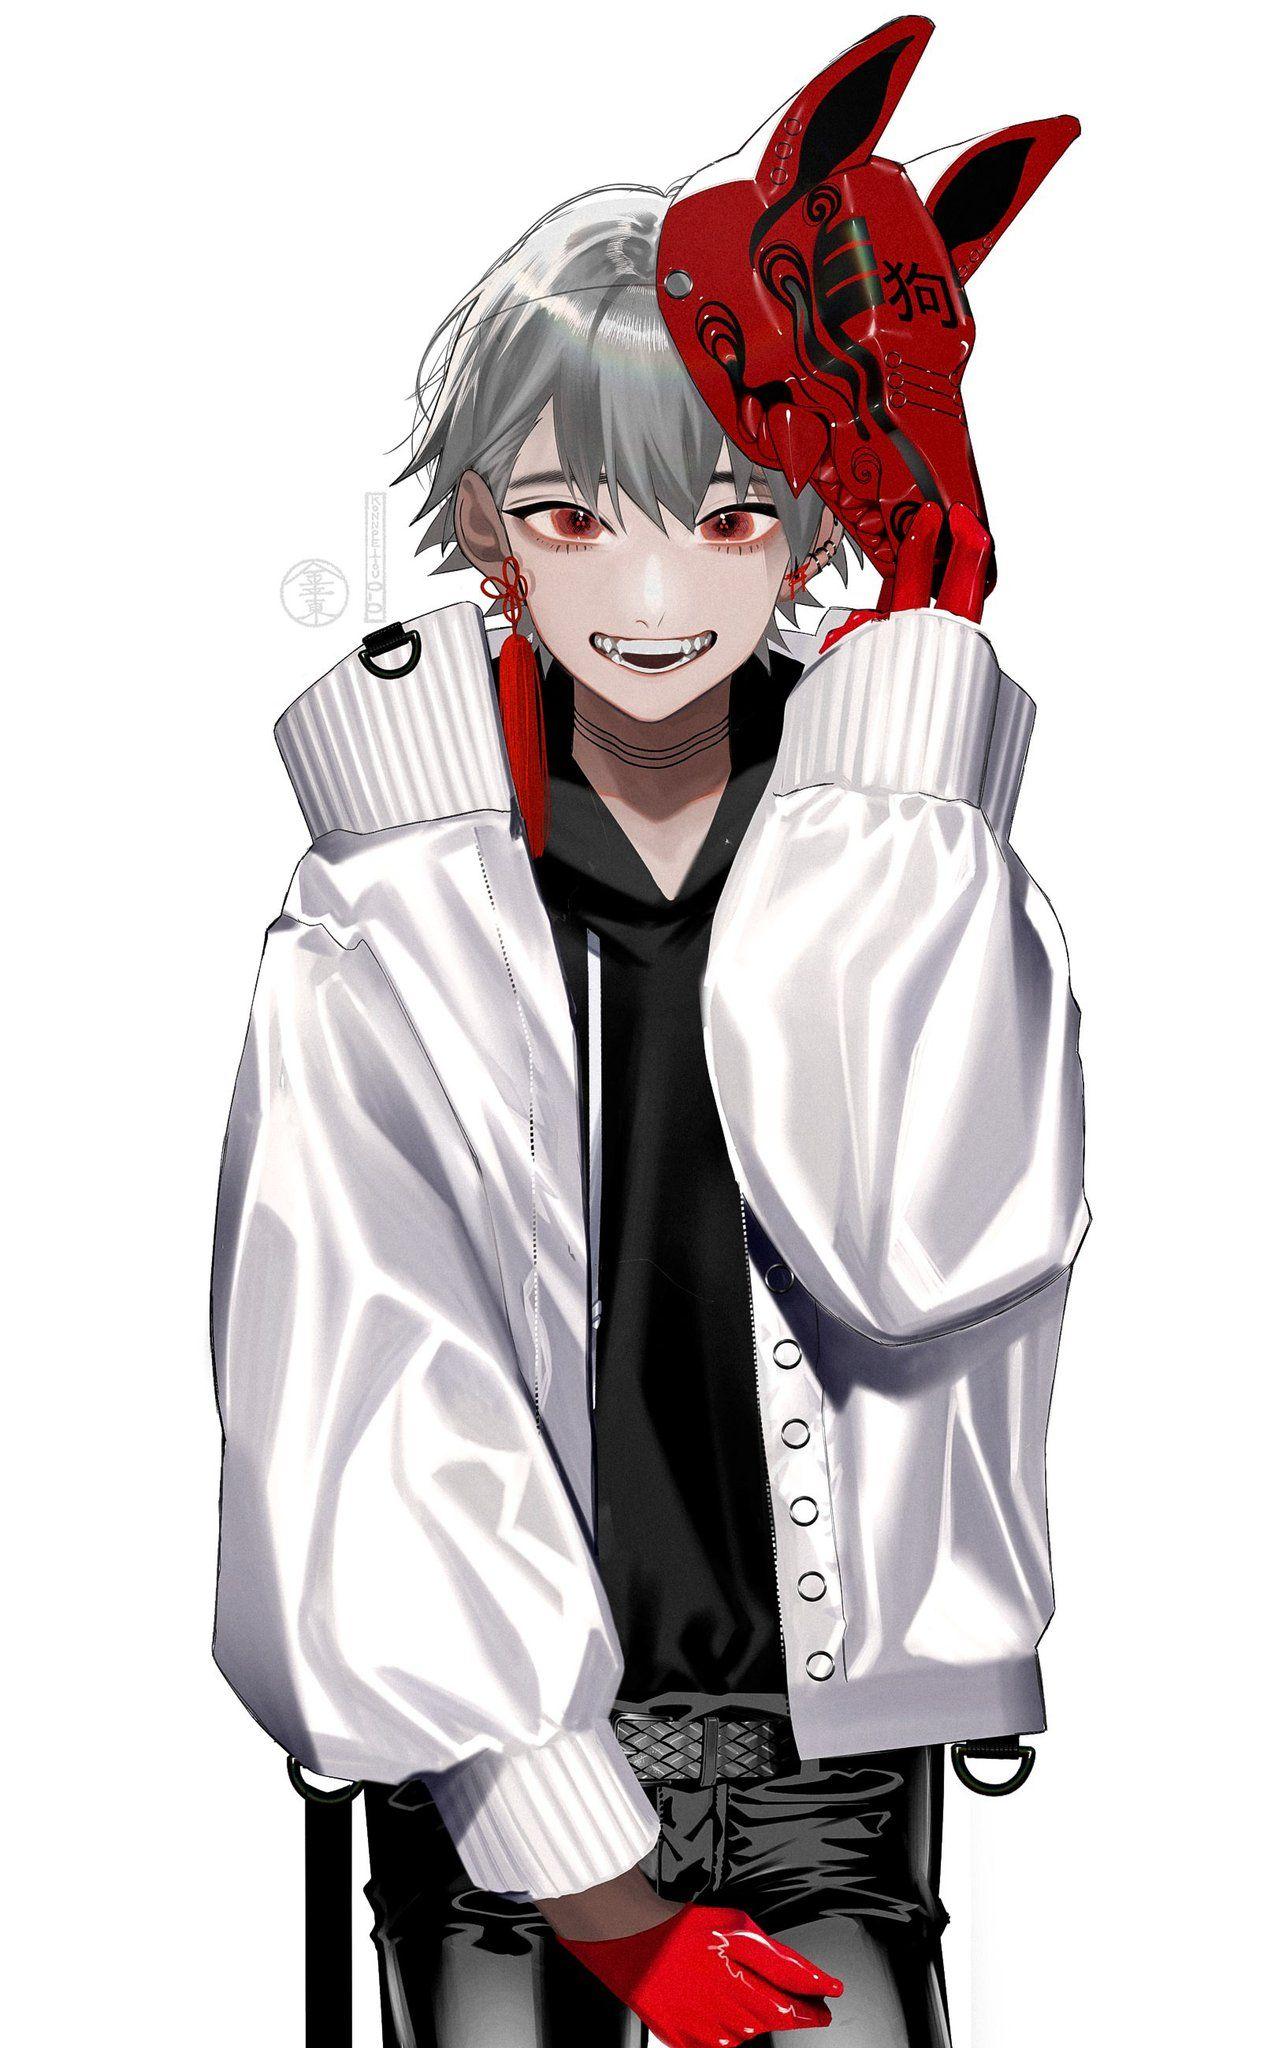 White Aesthetic Anime Boy